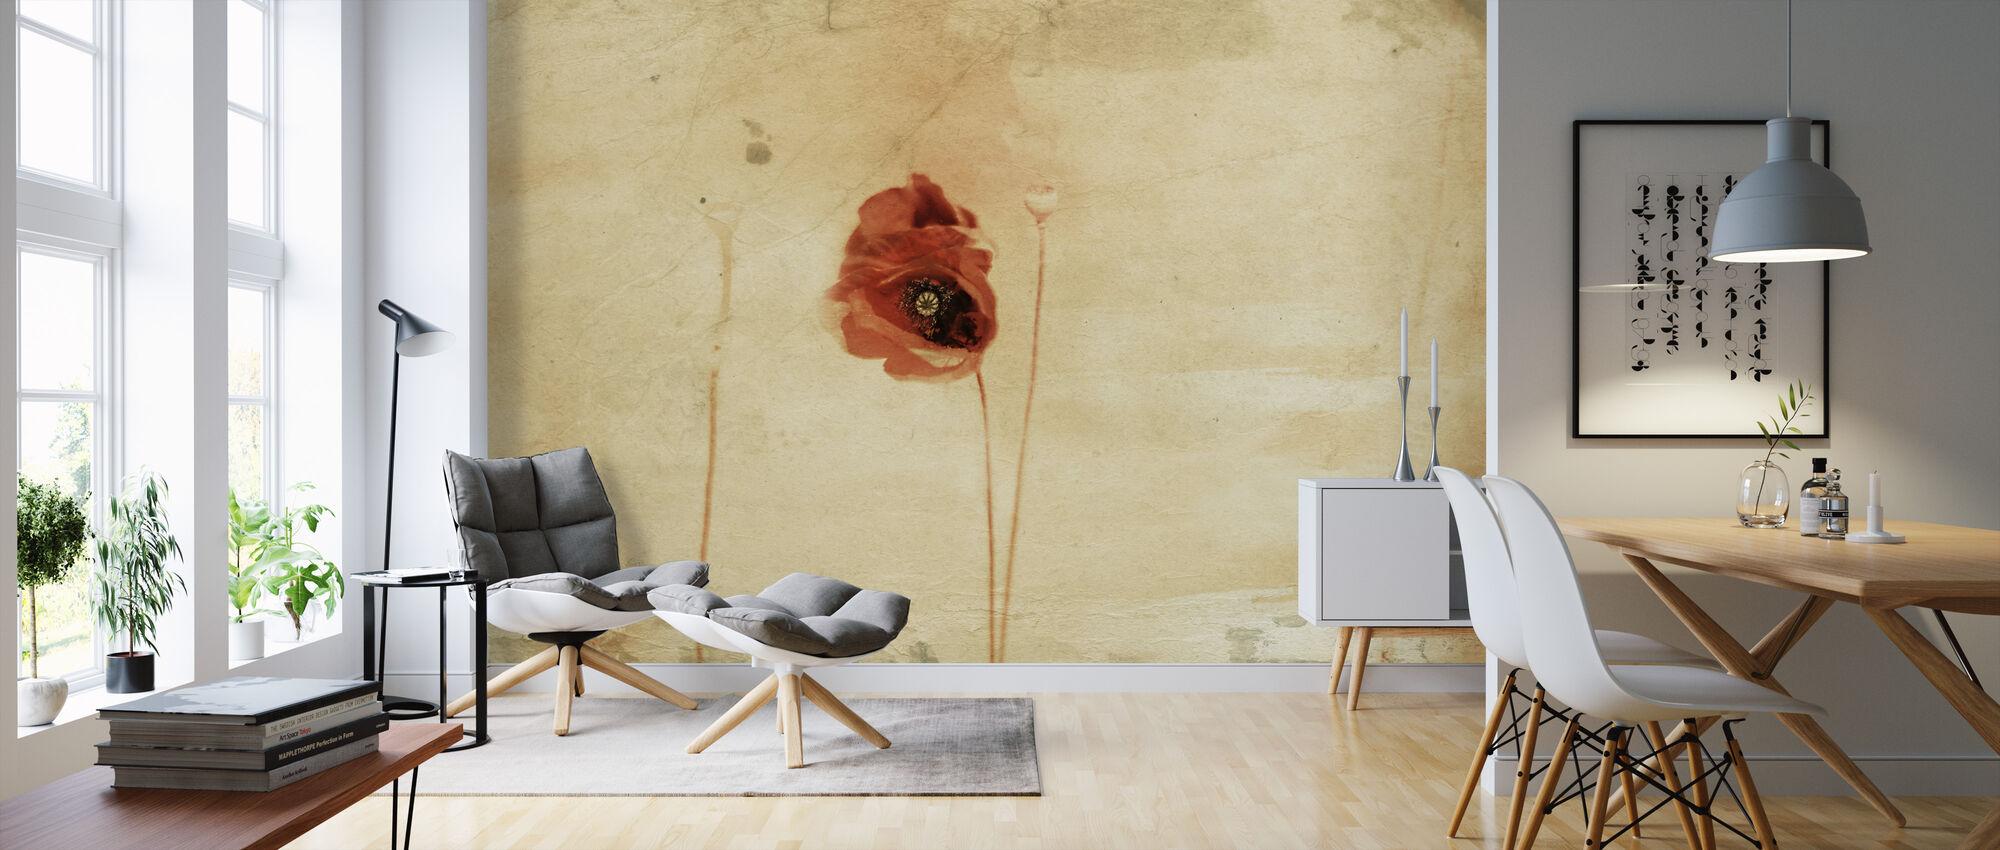 Rose Wall Paiting - Wallpaper - Living Room